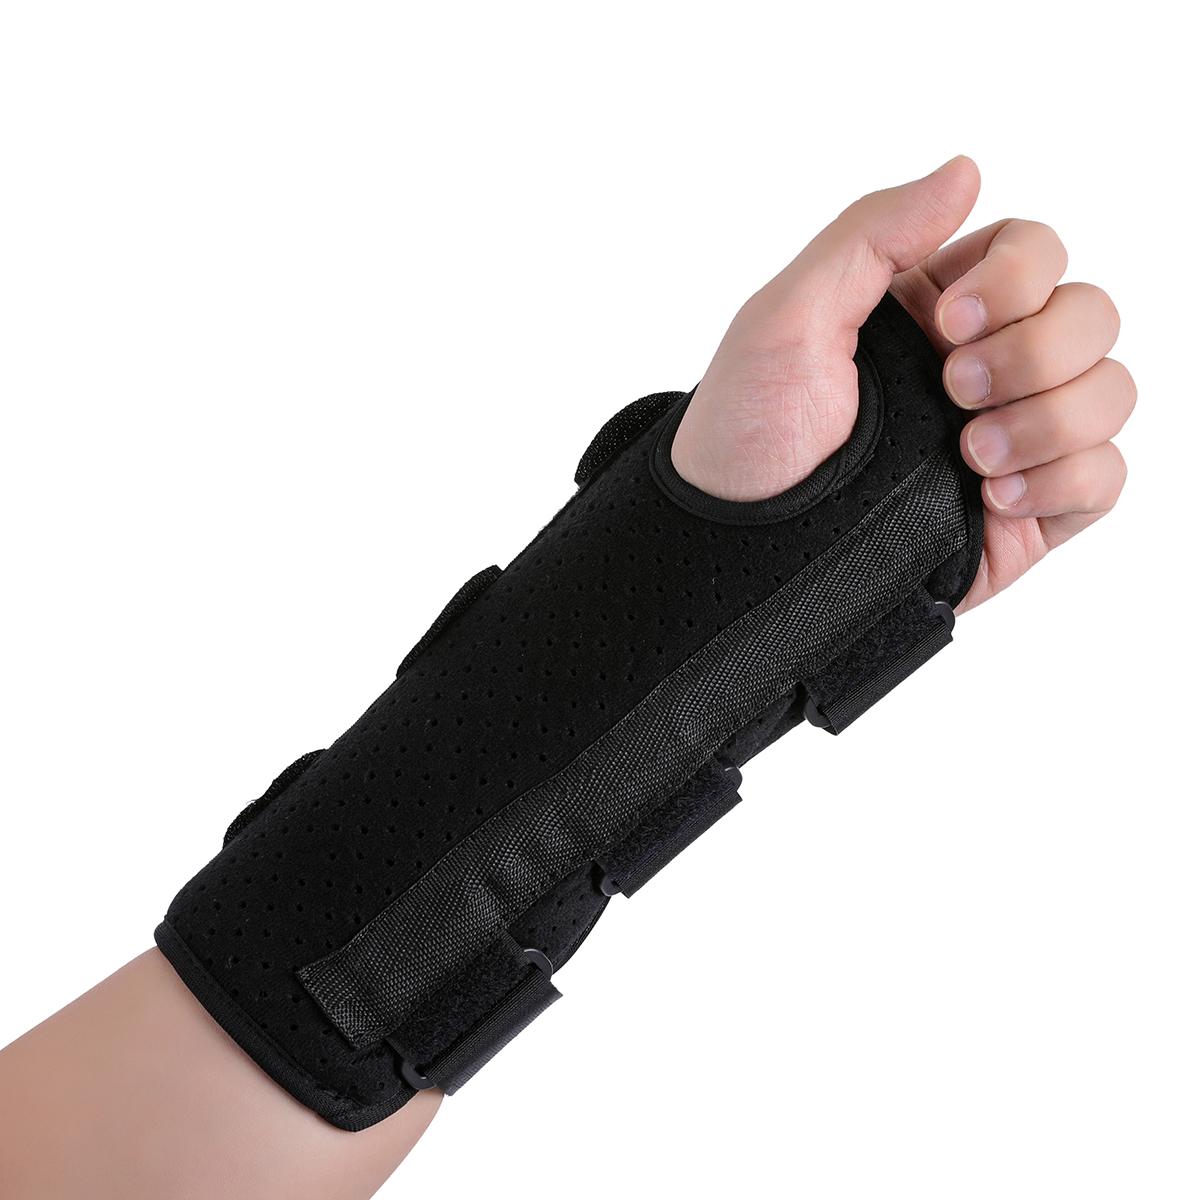 NASUM Wrist Brace Hunting Sports Rehabilitation Arm Sleeve Relieving Wrist Pain, Carpal Tunnel, Tendinitis, Sprains, Arthritis